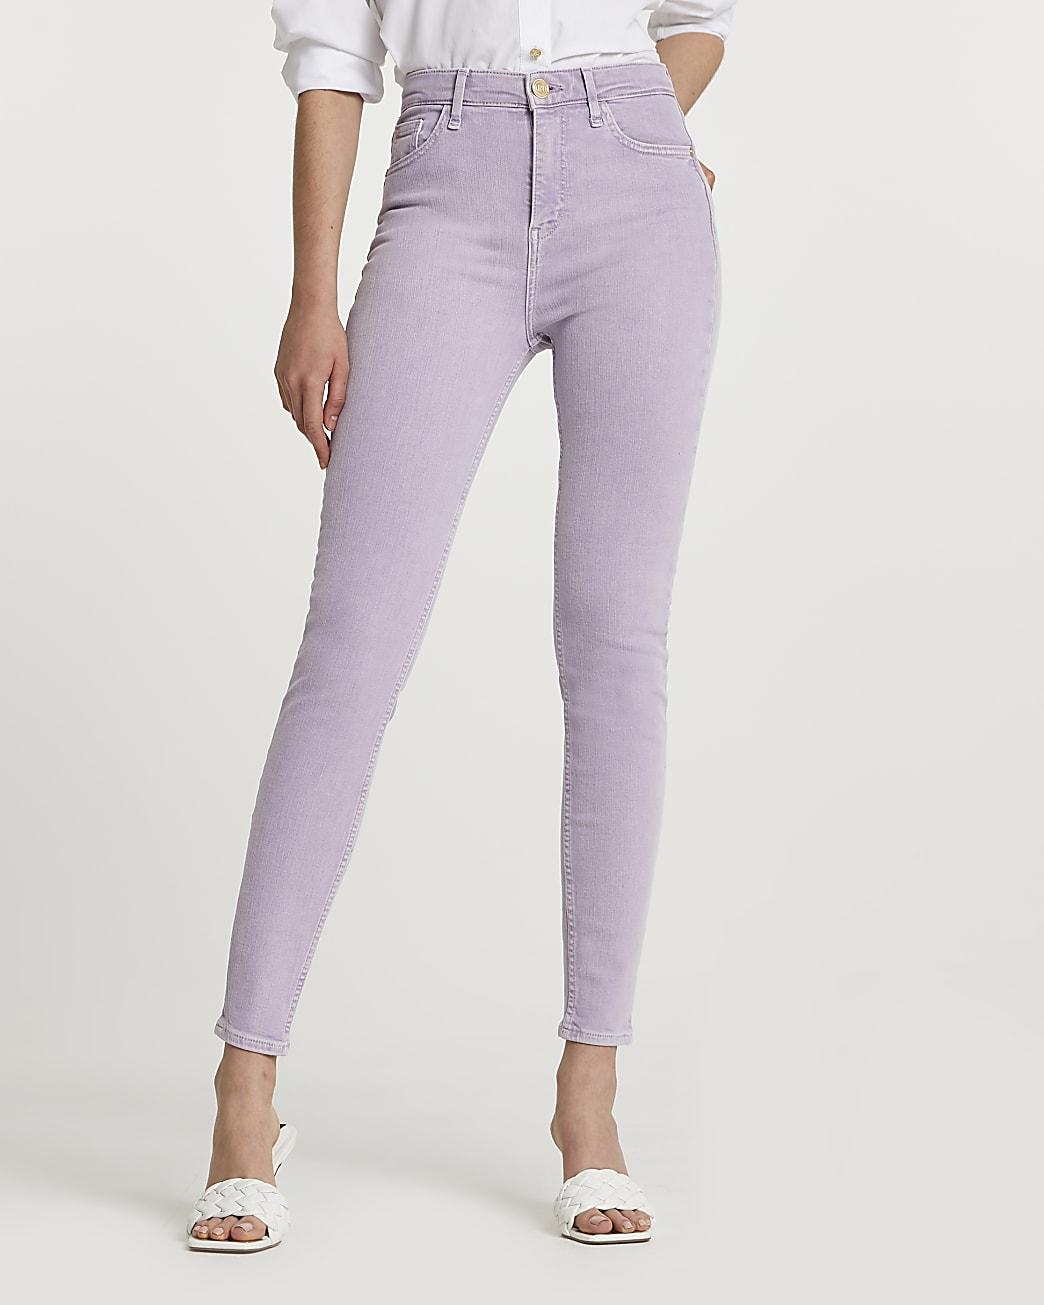 Purple high rise skinny jeans